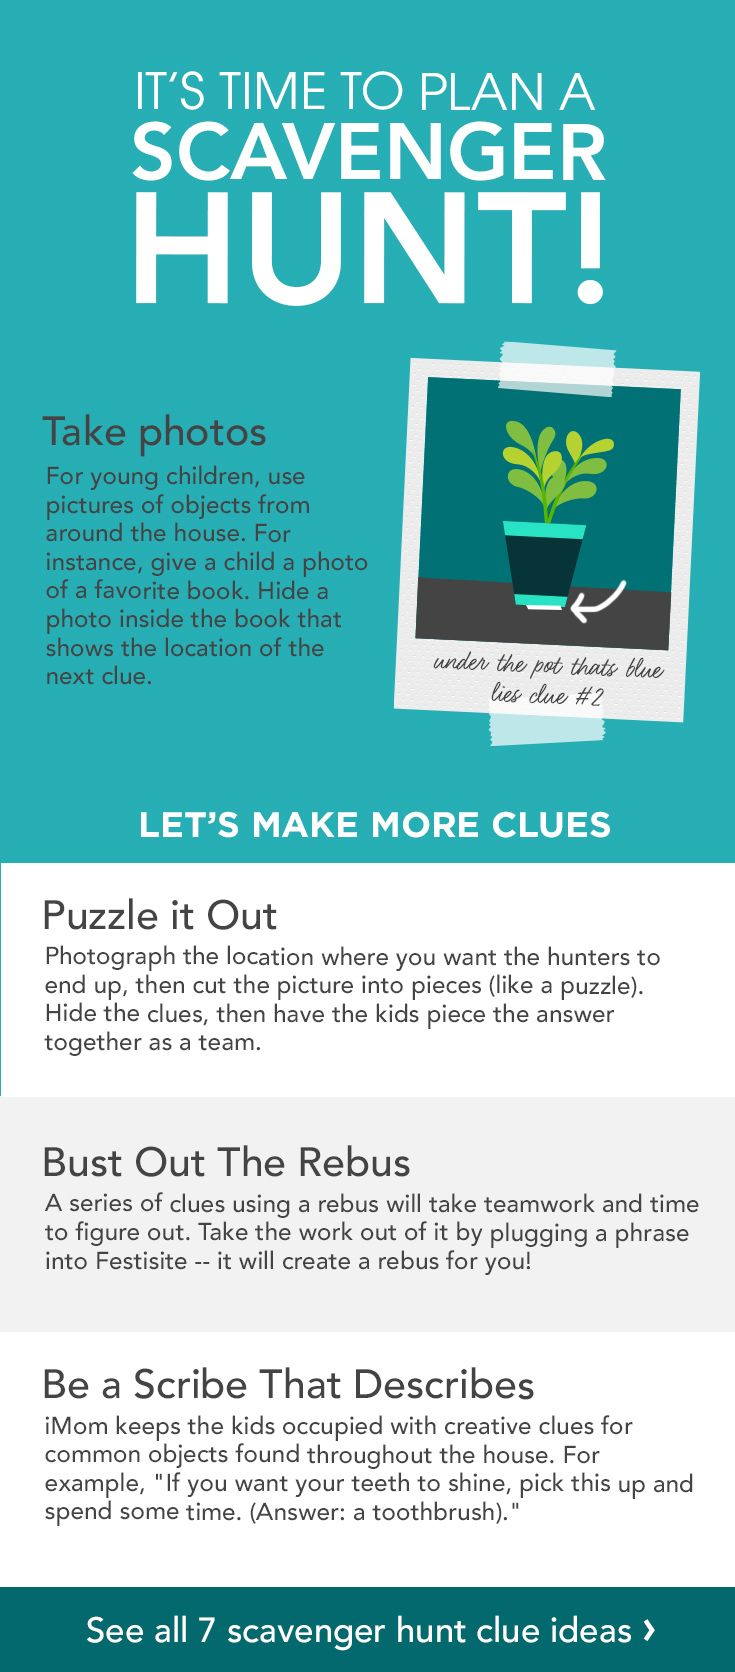 Creative Scavenger Hunt Clues for Kids Scavenger hunt